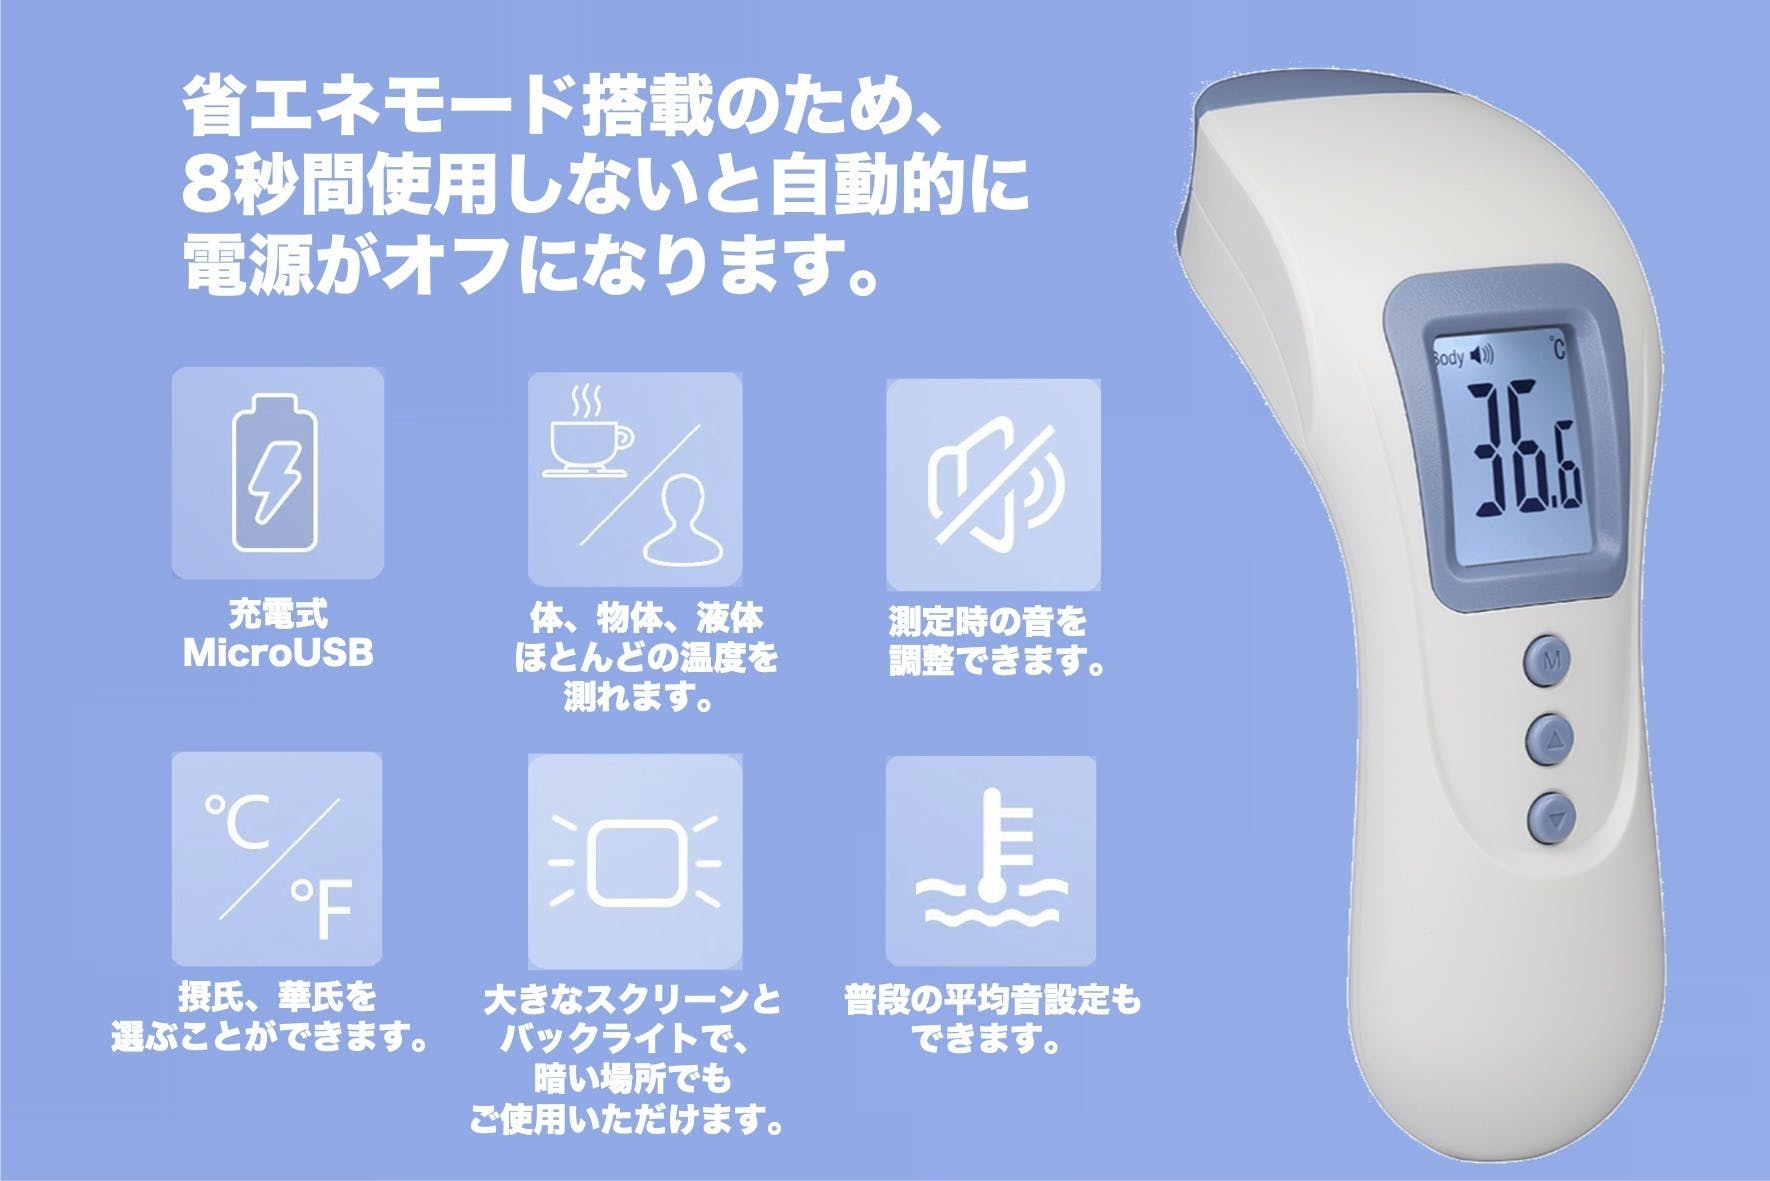 体温計 型 テム 原沢 hpc 非 工業 01 イージー 製薬 接触